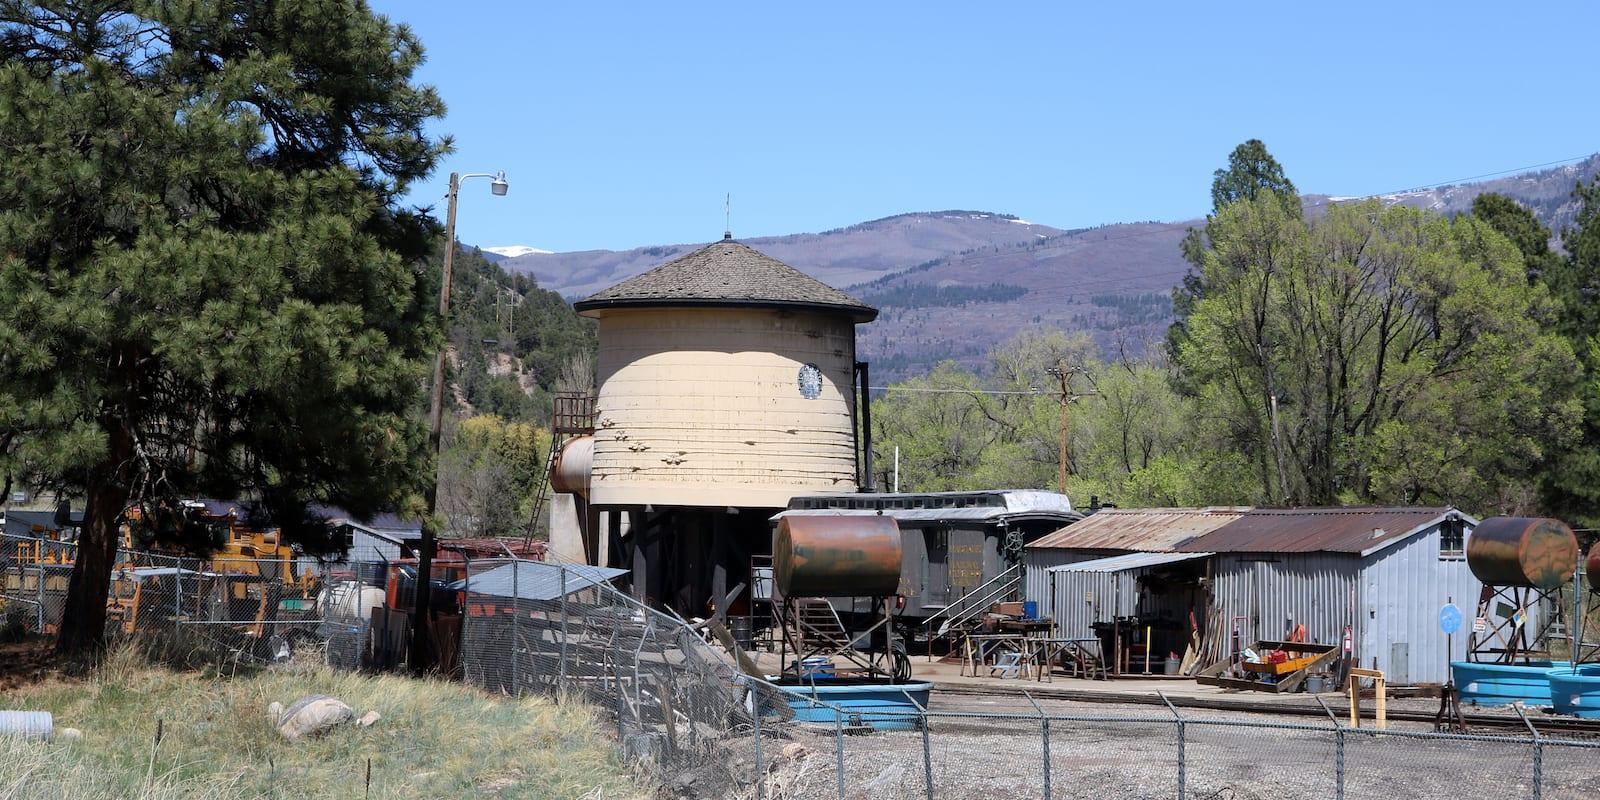 Hermosa Colorado Durango and Silverton Railroad Water Tank on Highway 550